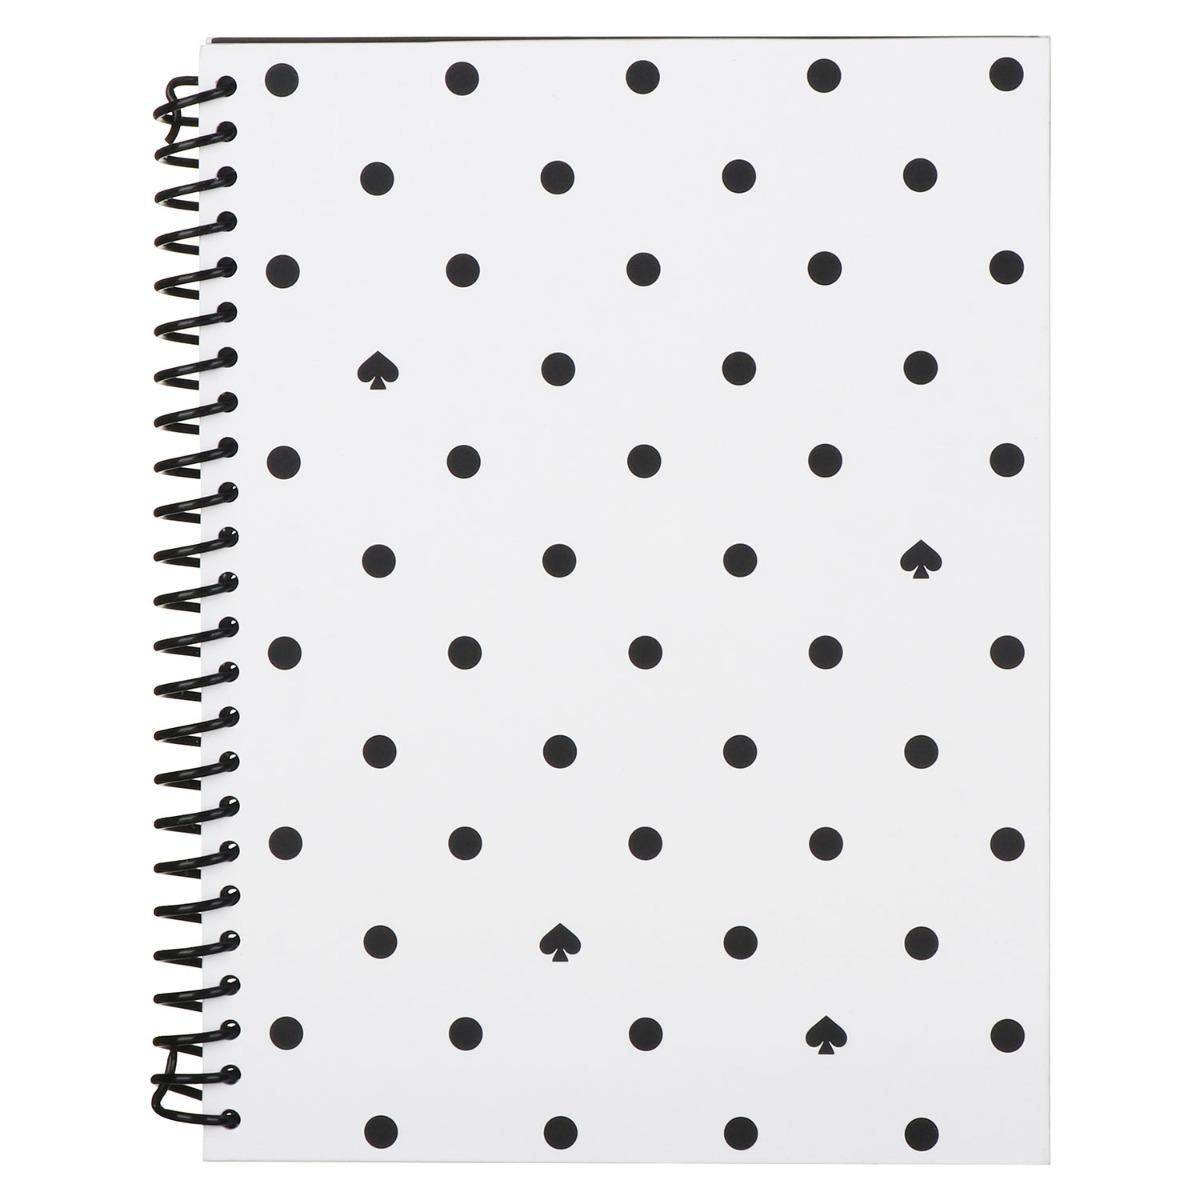 Kate Spade New York Black Spade Dot Small Spiral Notebook